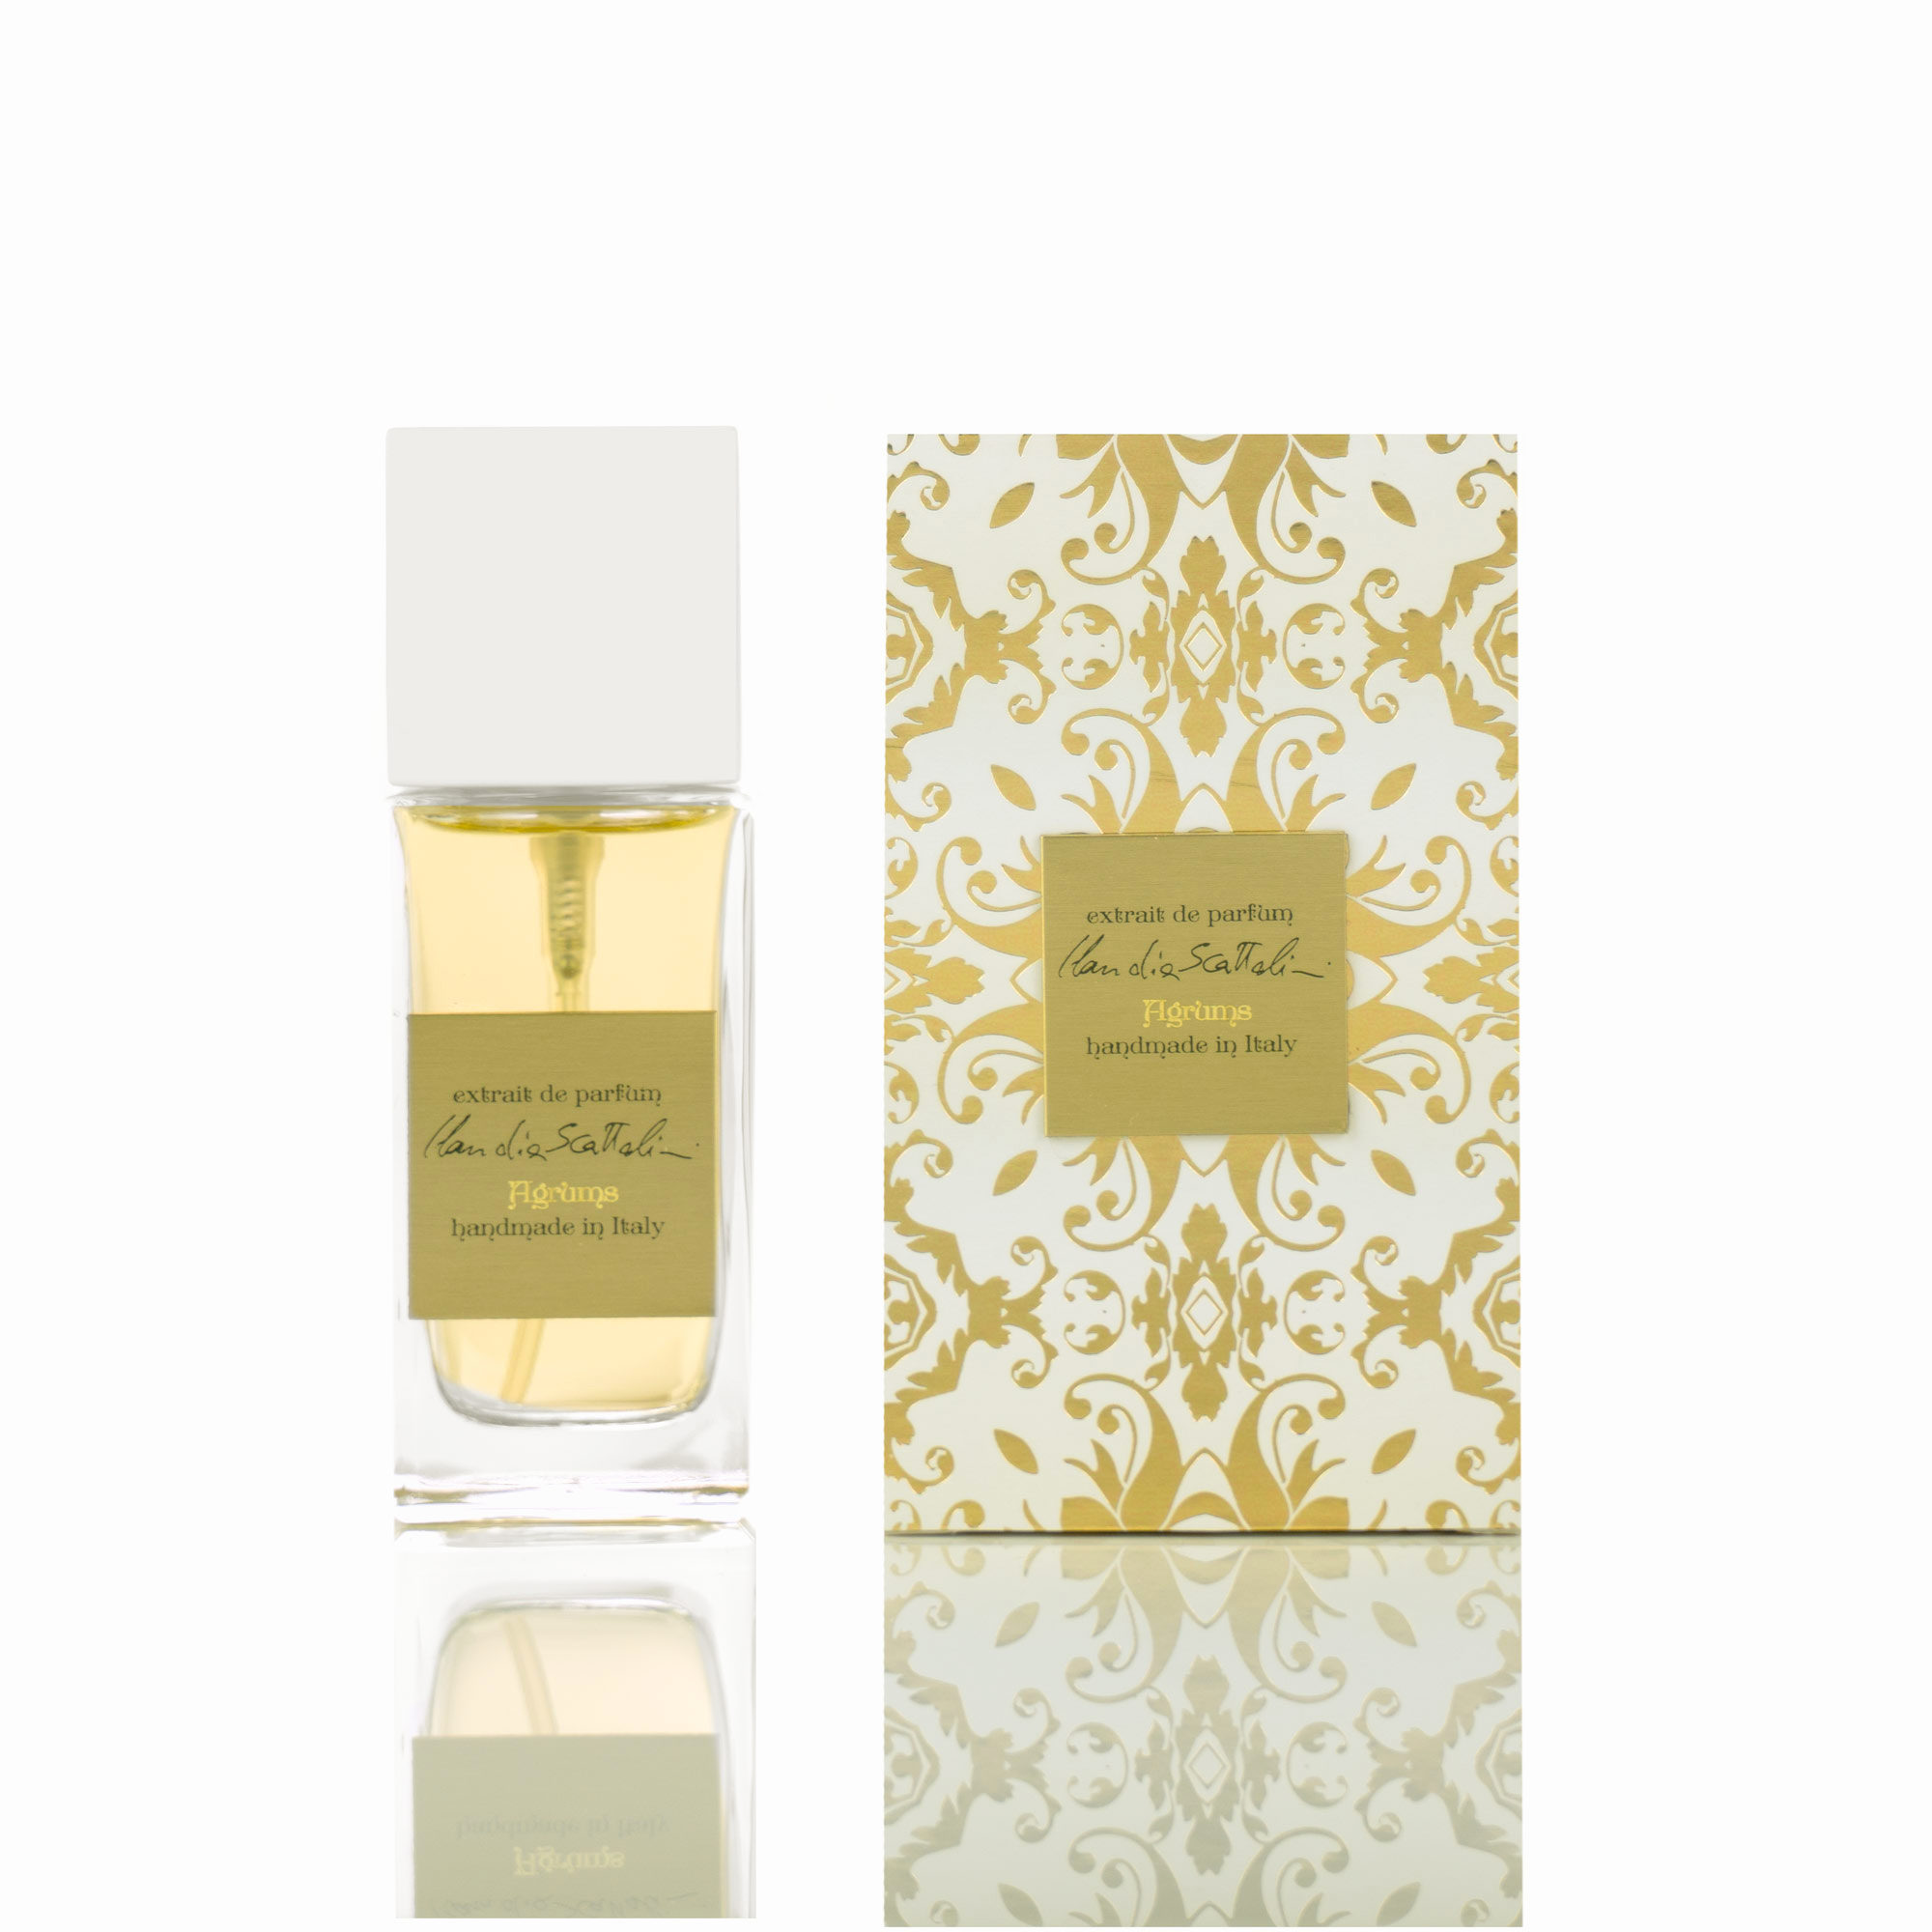 Extrait de parfum AGRUMS Agrumi